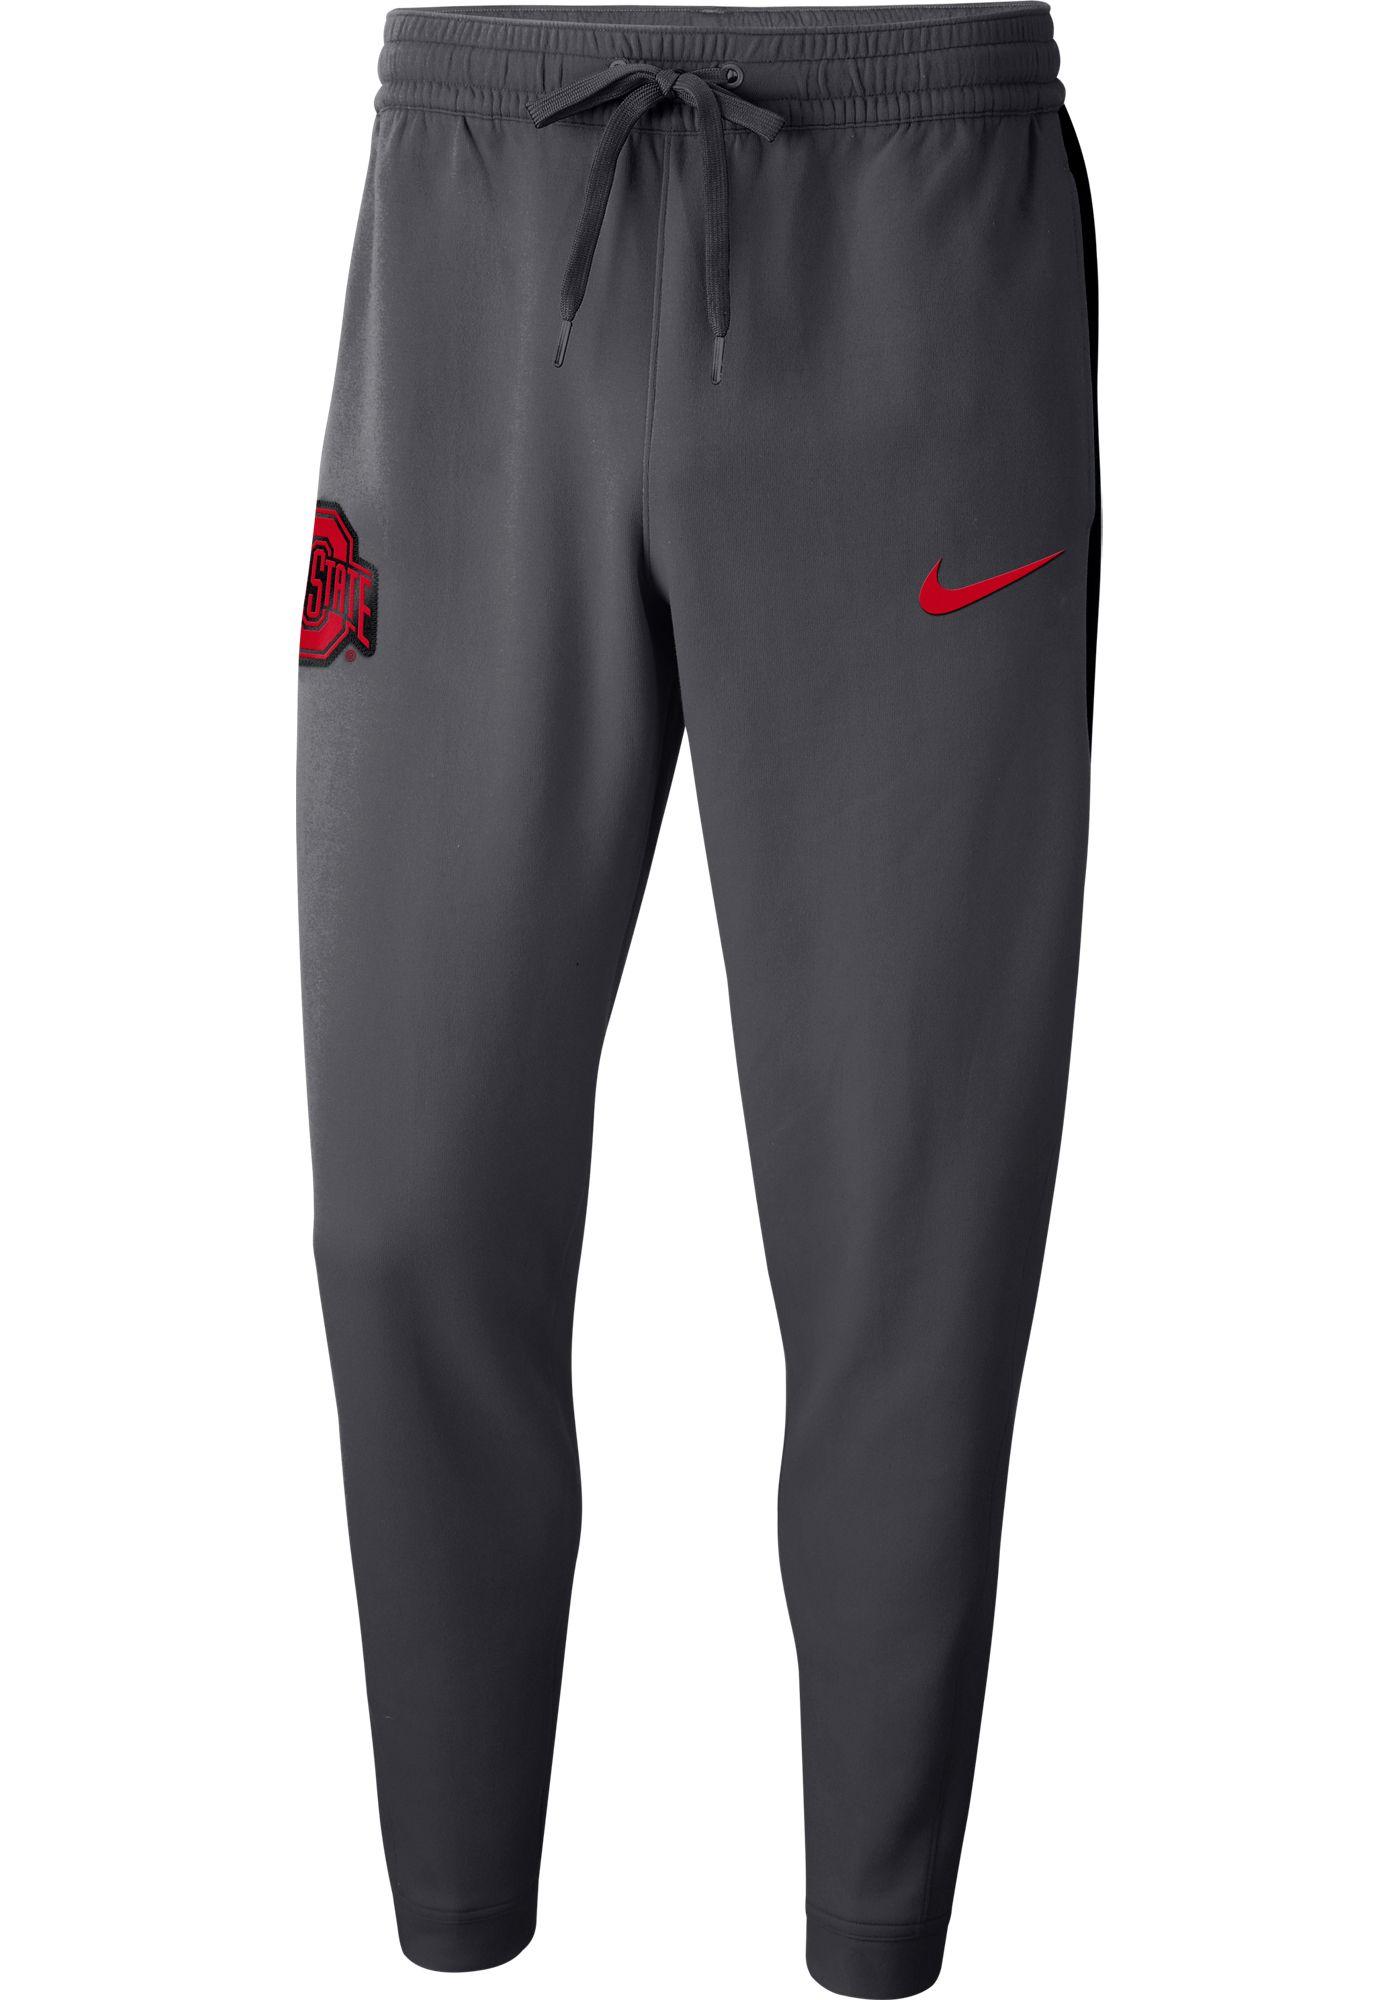 Nike Men's Ohio State Buckeyes Gray Dri-FIT Showtime Basketball Fleece Pants